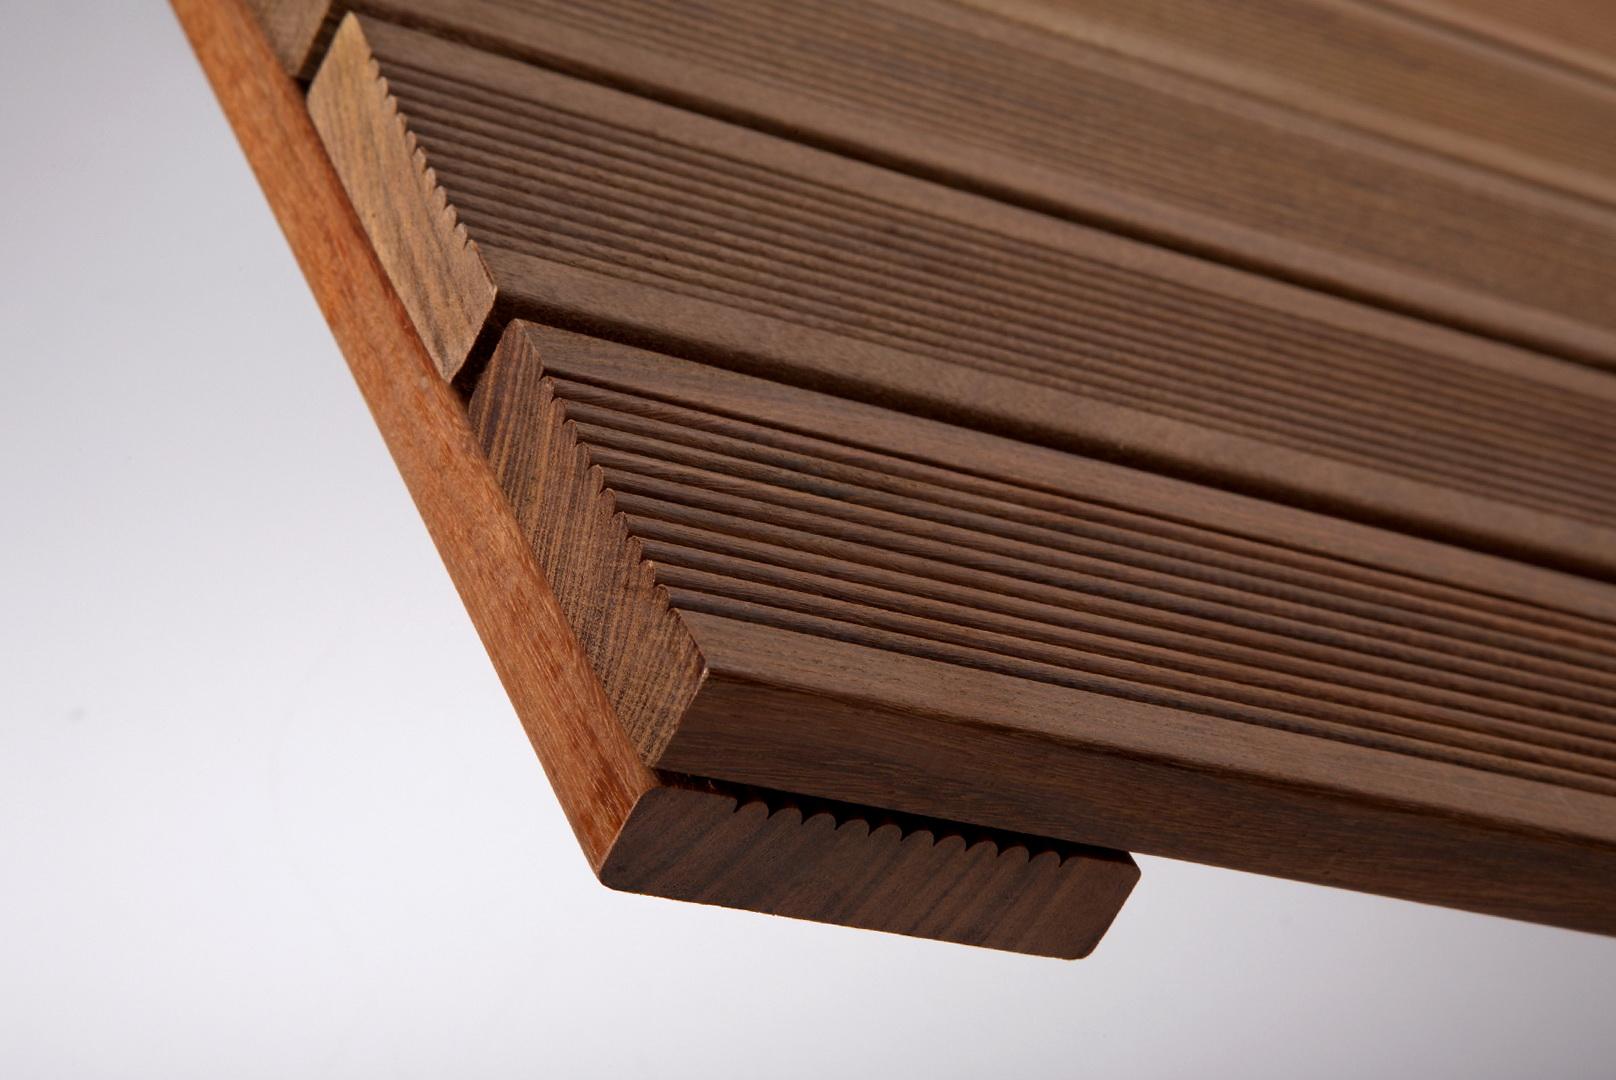 Epay Wood Decking Tiles Home Design Ideas